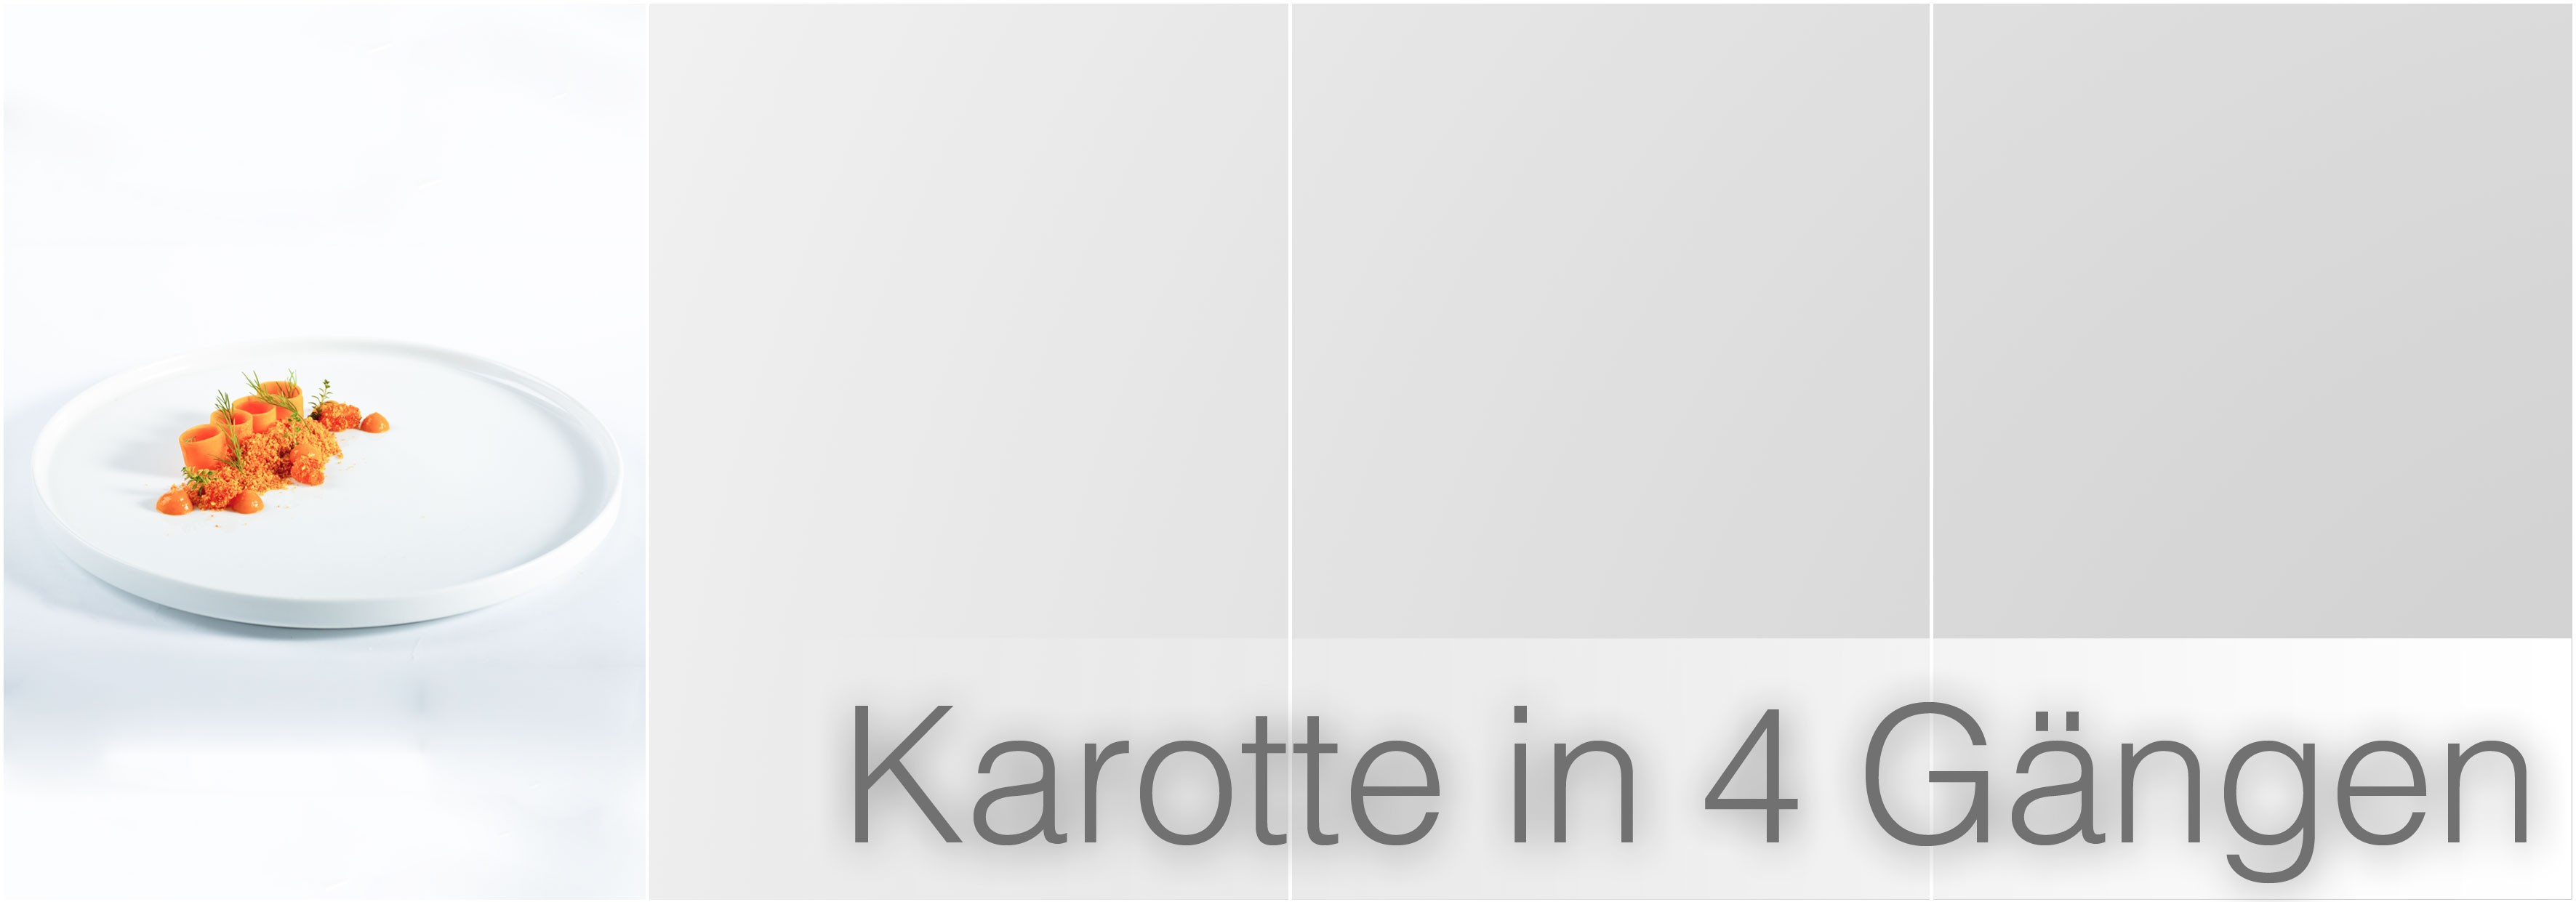 Karotte-in-4-Gängen-1-groß